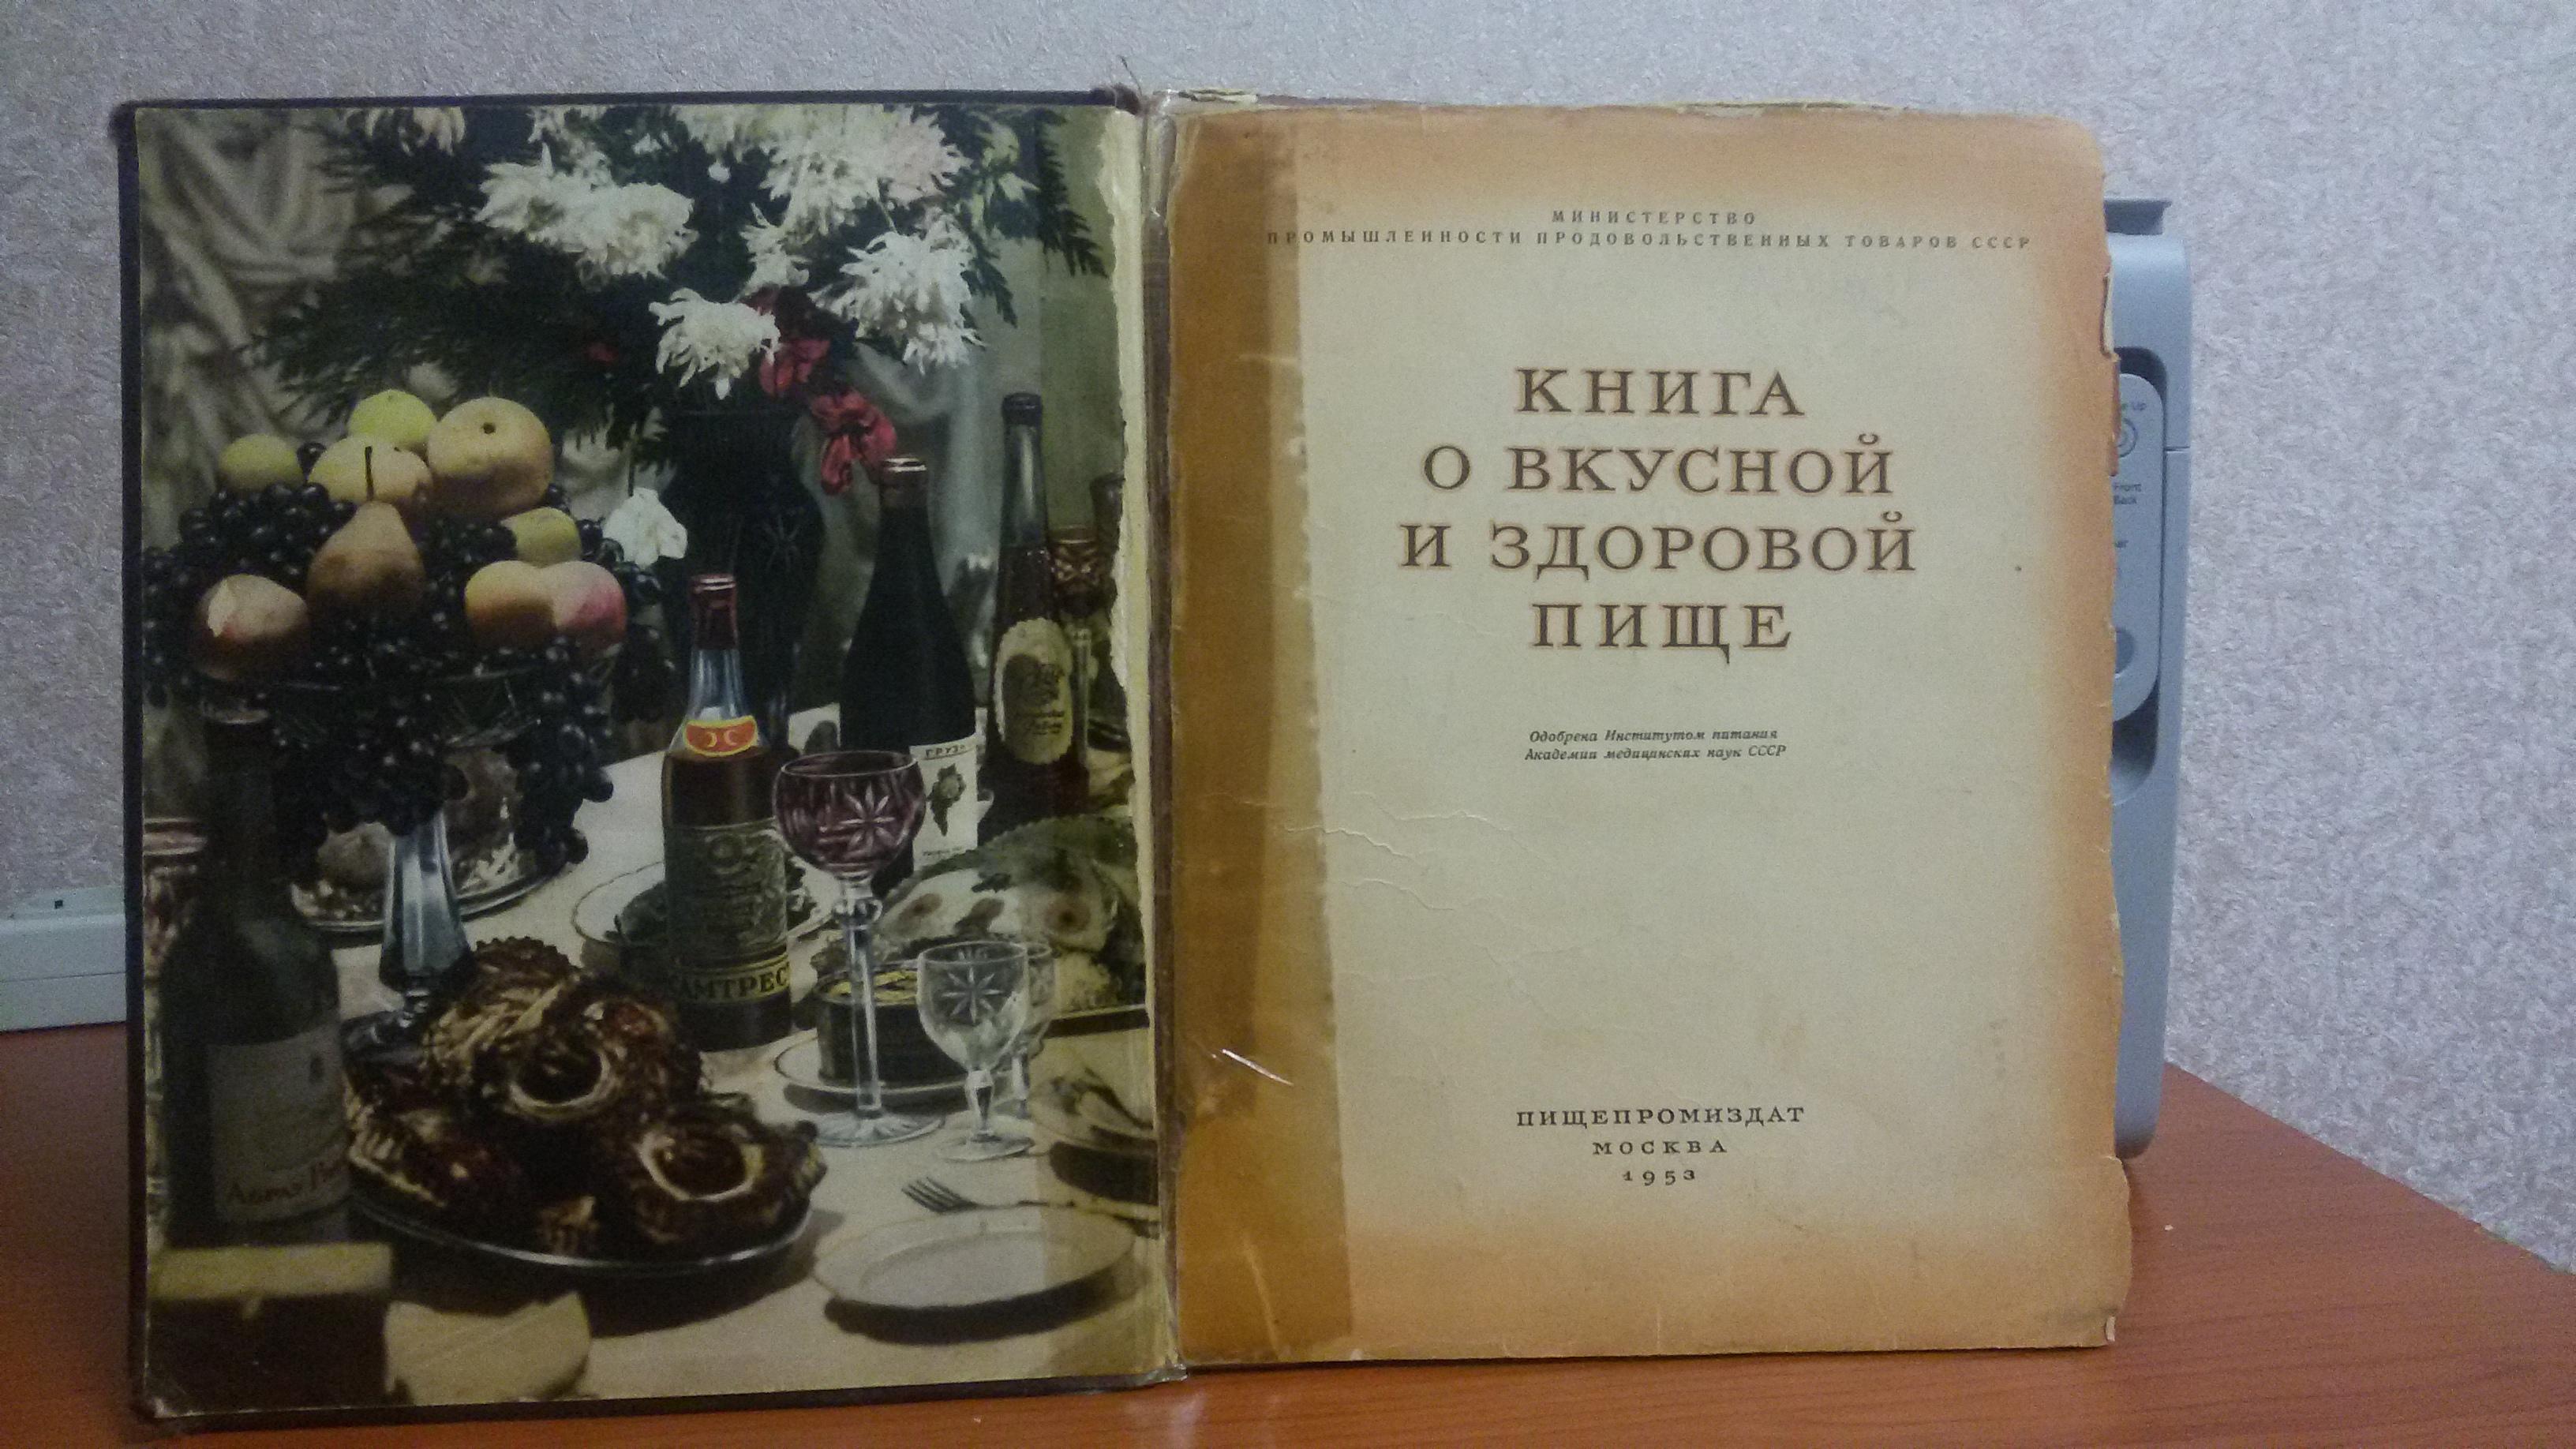 http://s2.uploads.ru/Kl4W6.jpg